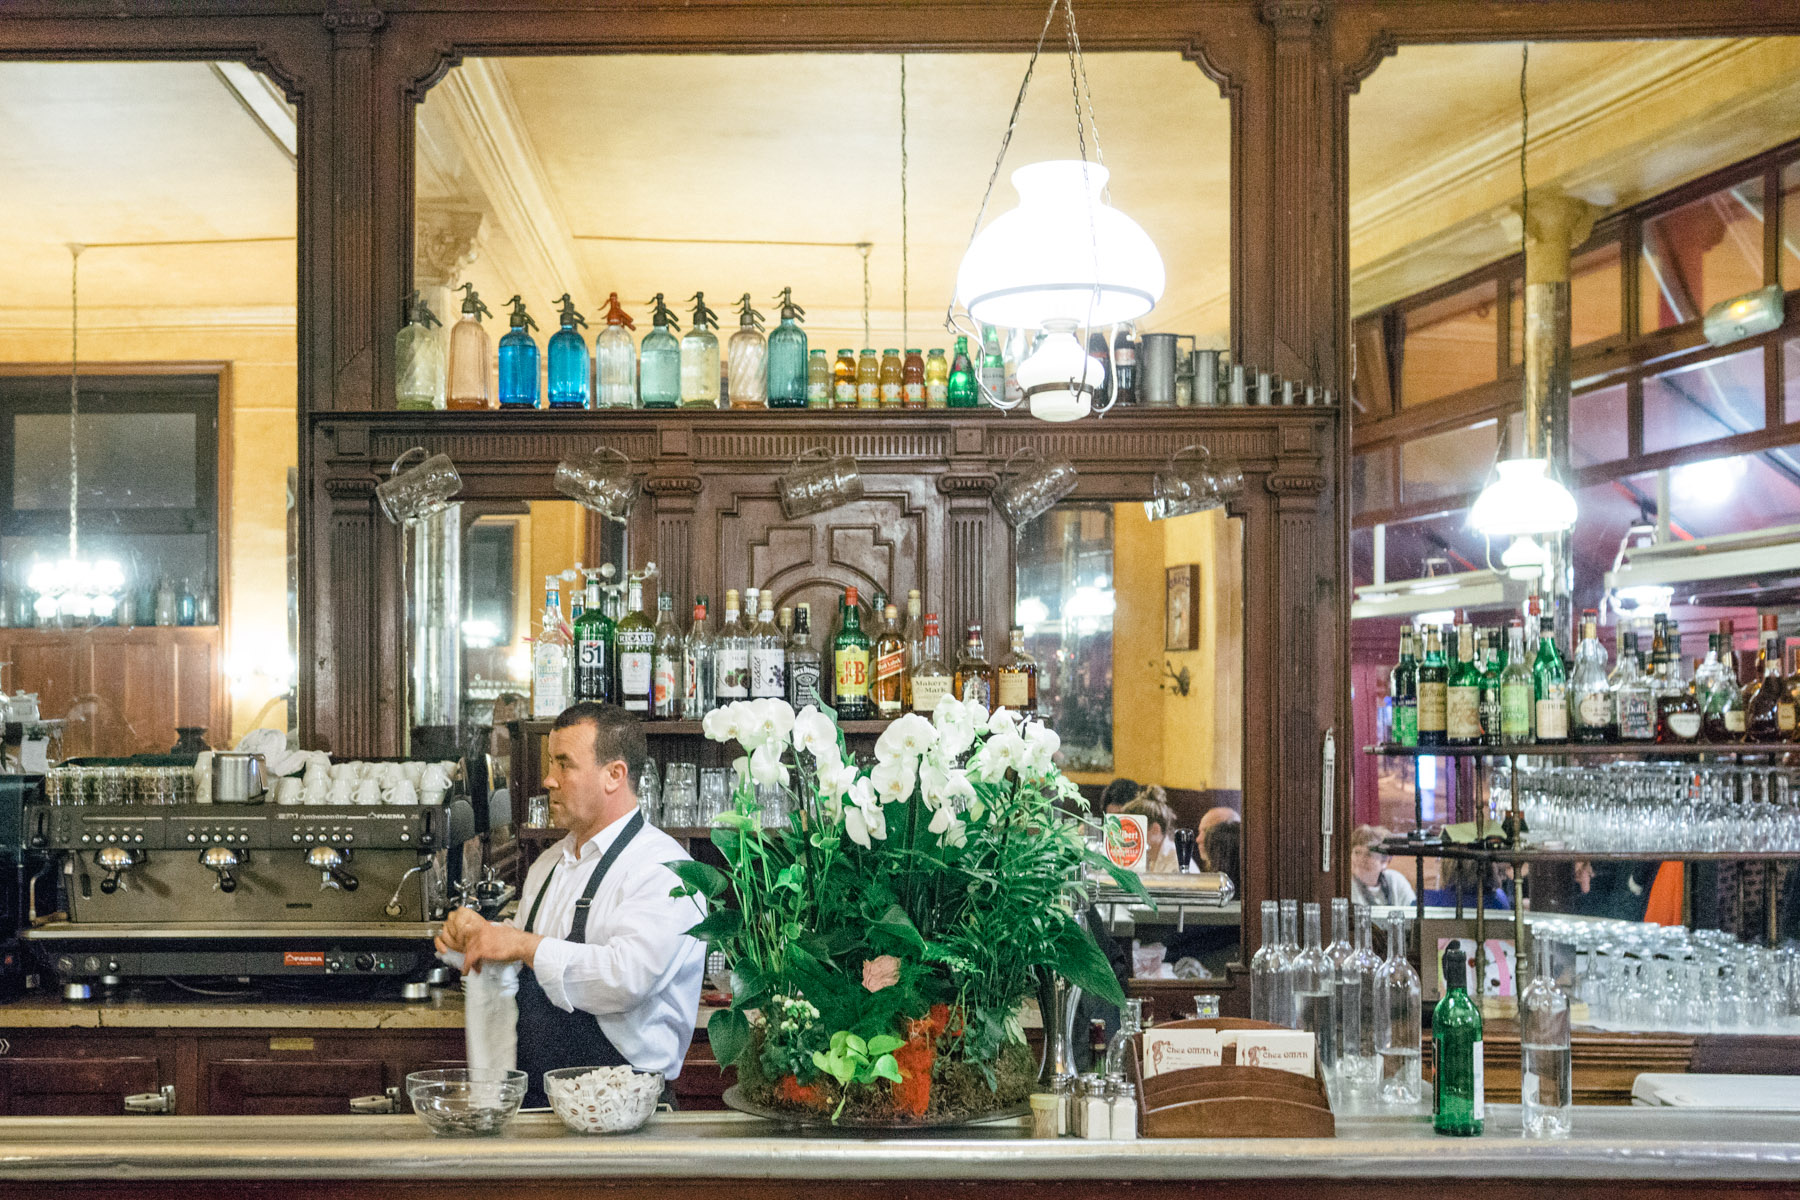 moroccan restaurants in sydney - photo#29